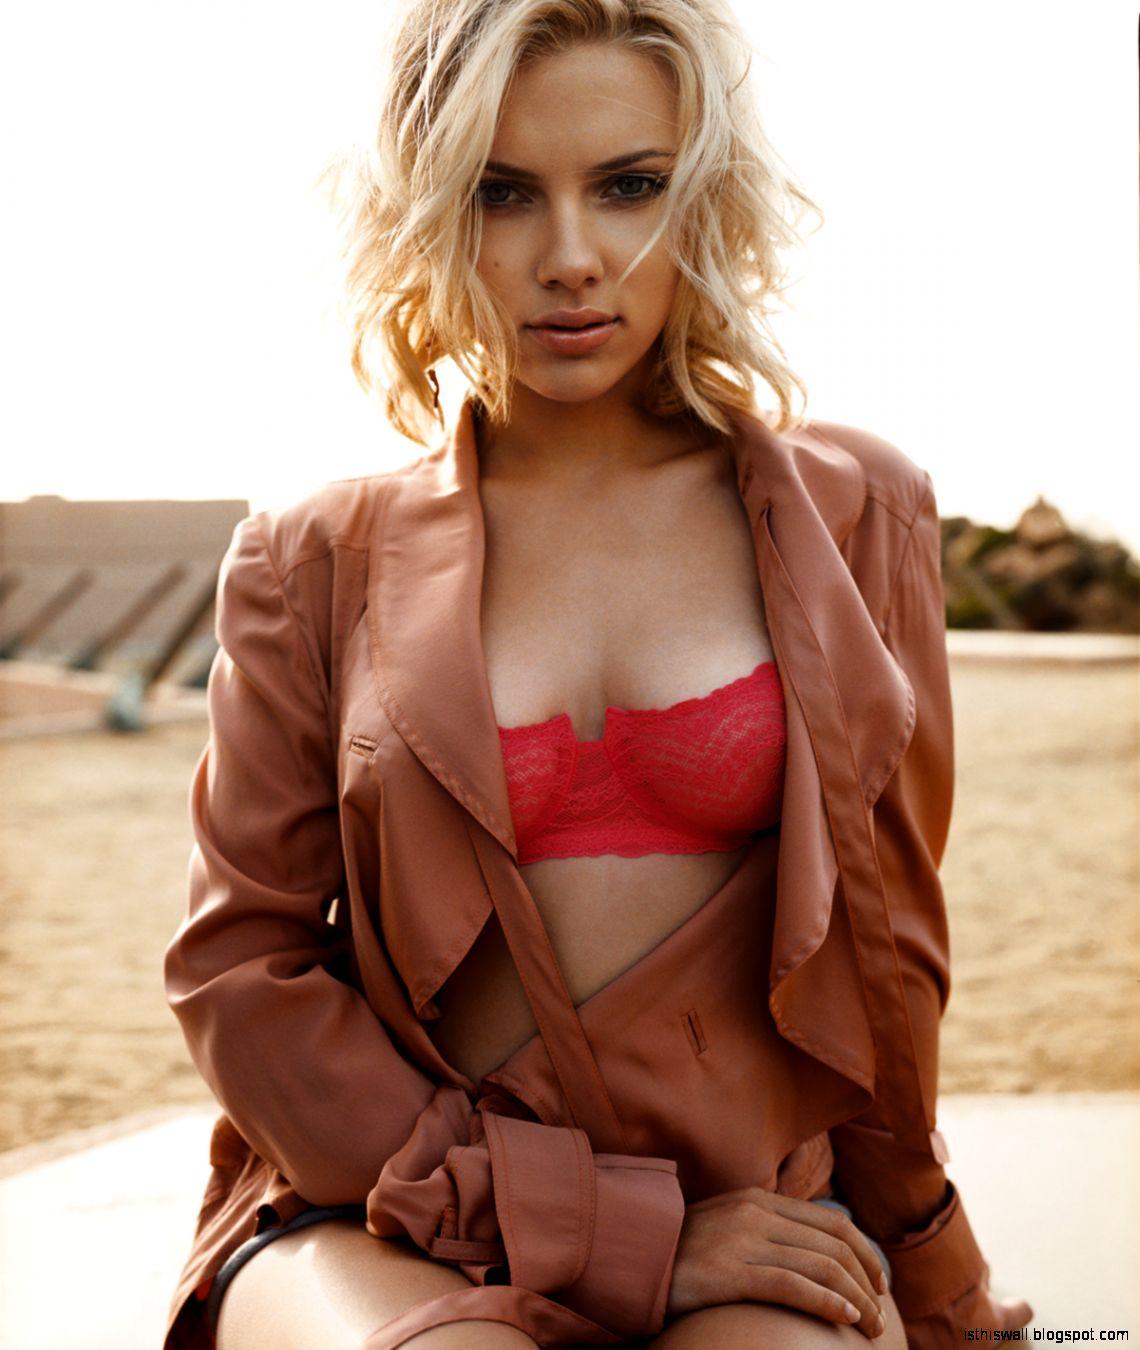 Scarlett Johansson 2013 iest Woman Alive Photos and Video